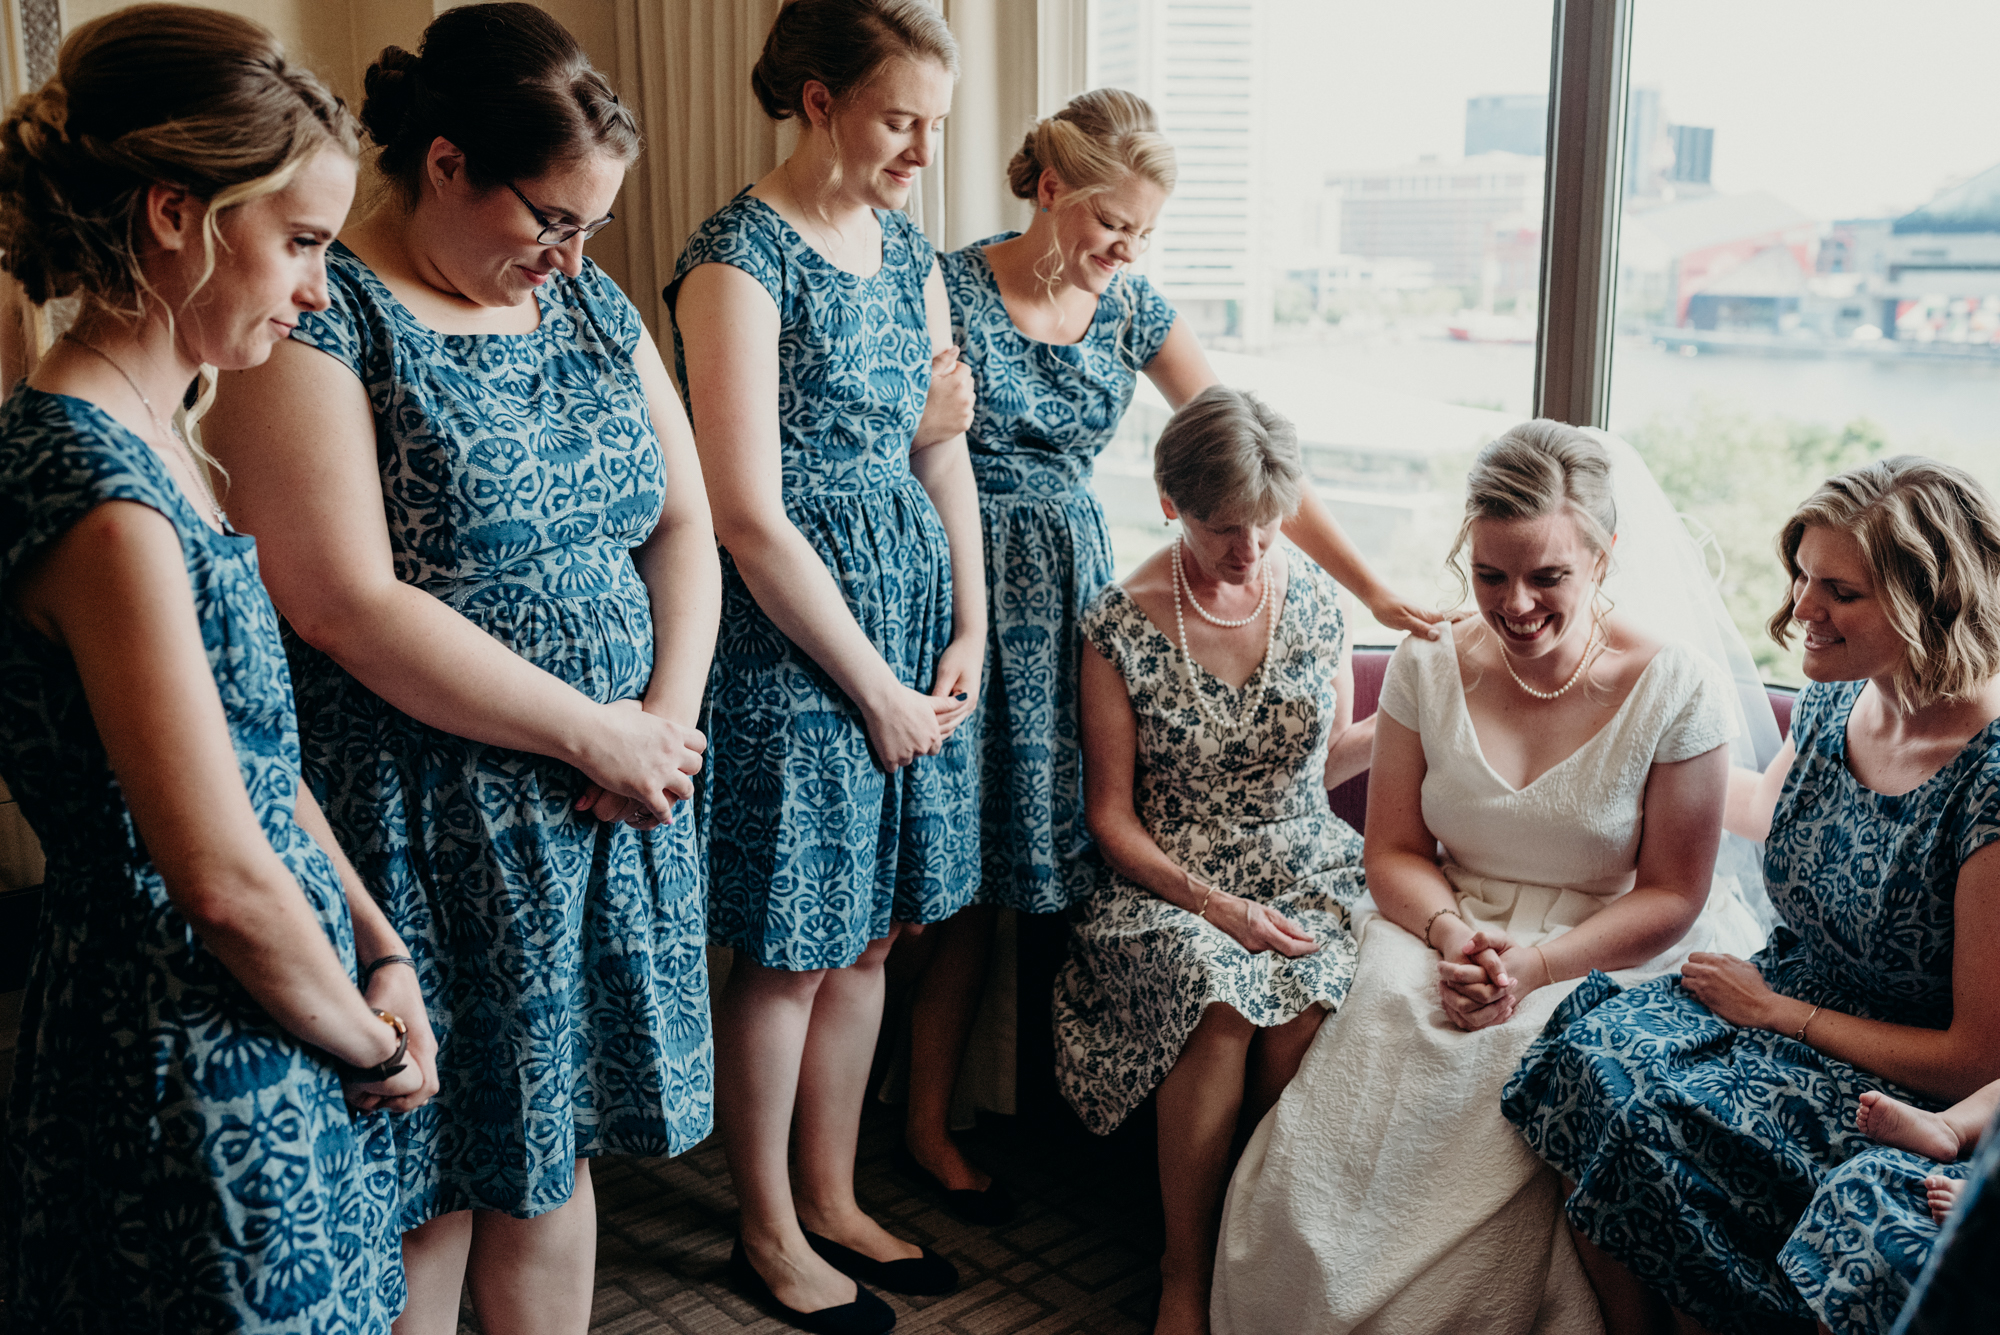 catholic-social-teaching-wedding-7.jpg